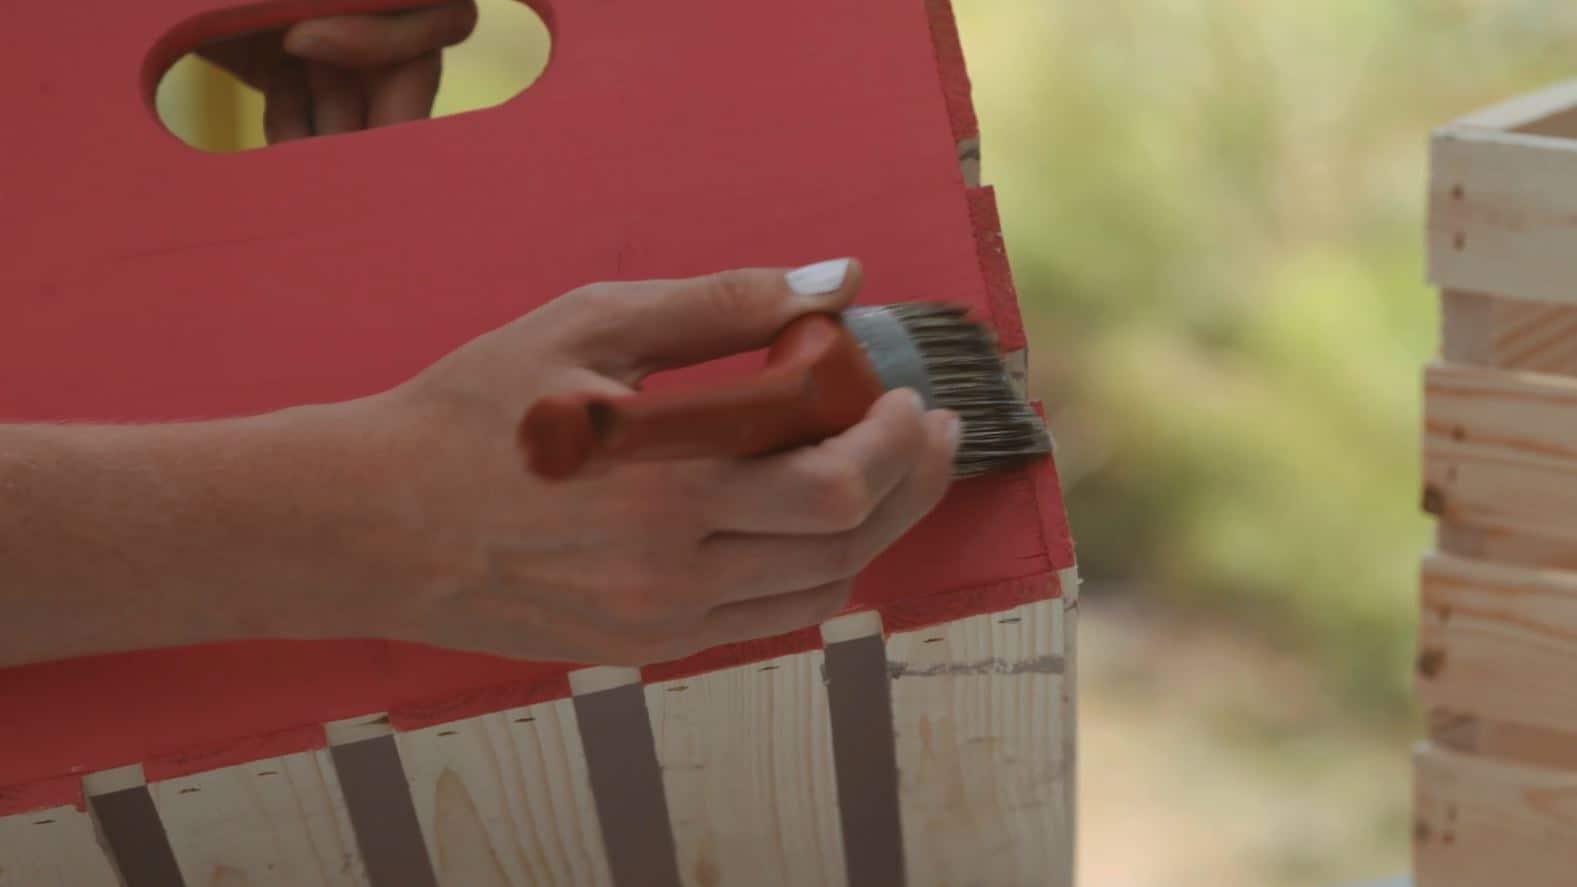 Crackle Medium Tutorial #DIY #antique #countrychicpaint #crackle #cracklemedium #furniturepaint #paintedfurniture #rustic #faux #howto #tutorial #video - blog.countrychicpaint.com